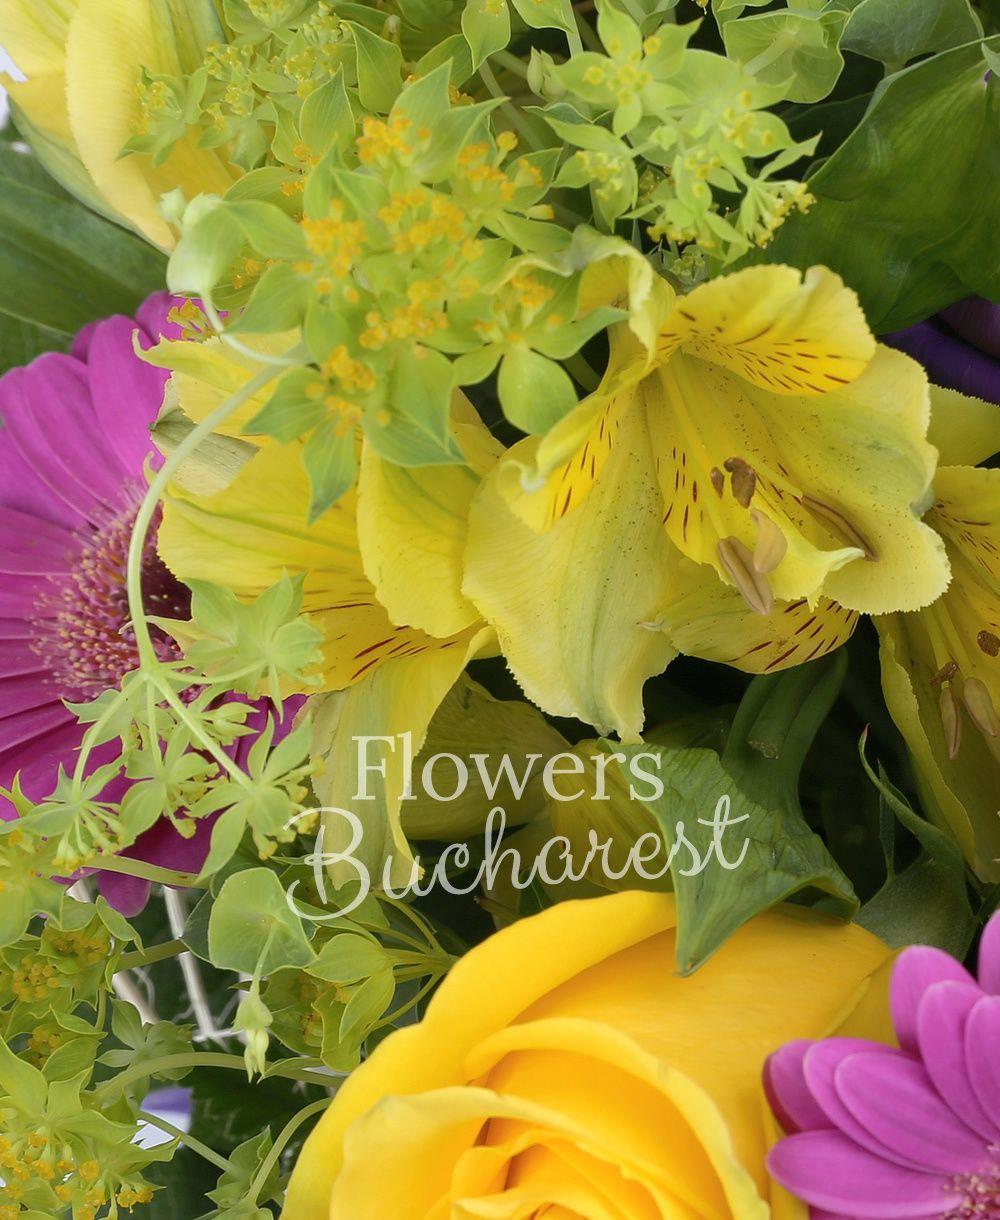 3 yellow roses, 5 cyclam gerbera, 3 yellow alstroemeria, 3 mauve lisianthus, greenery